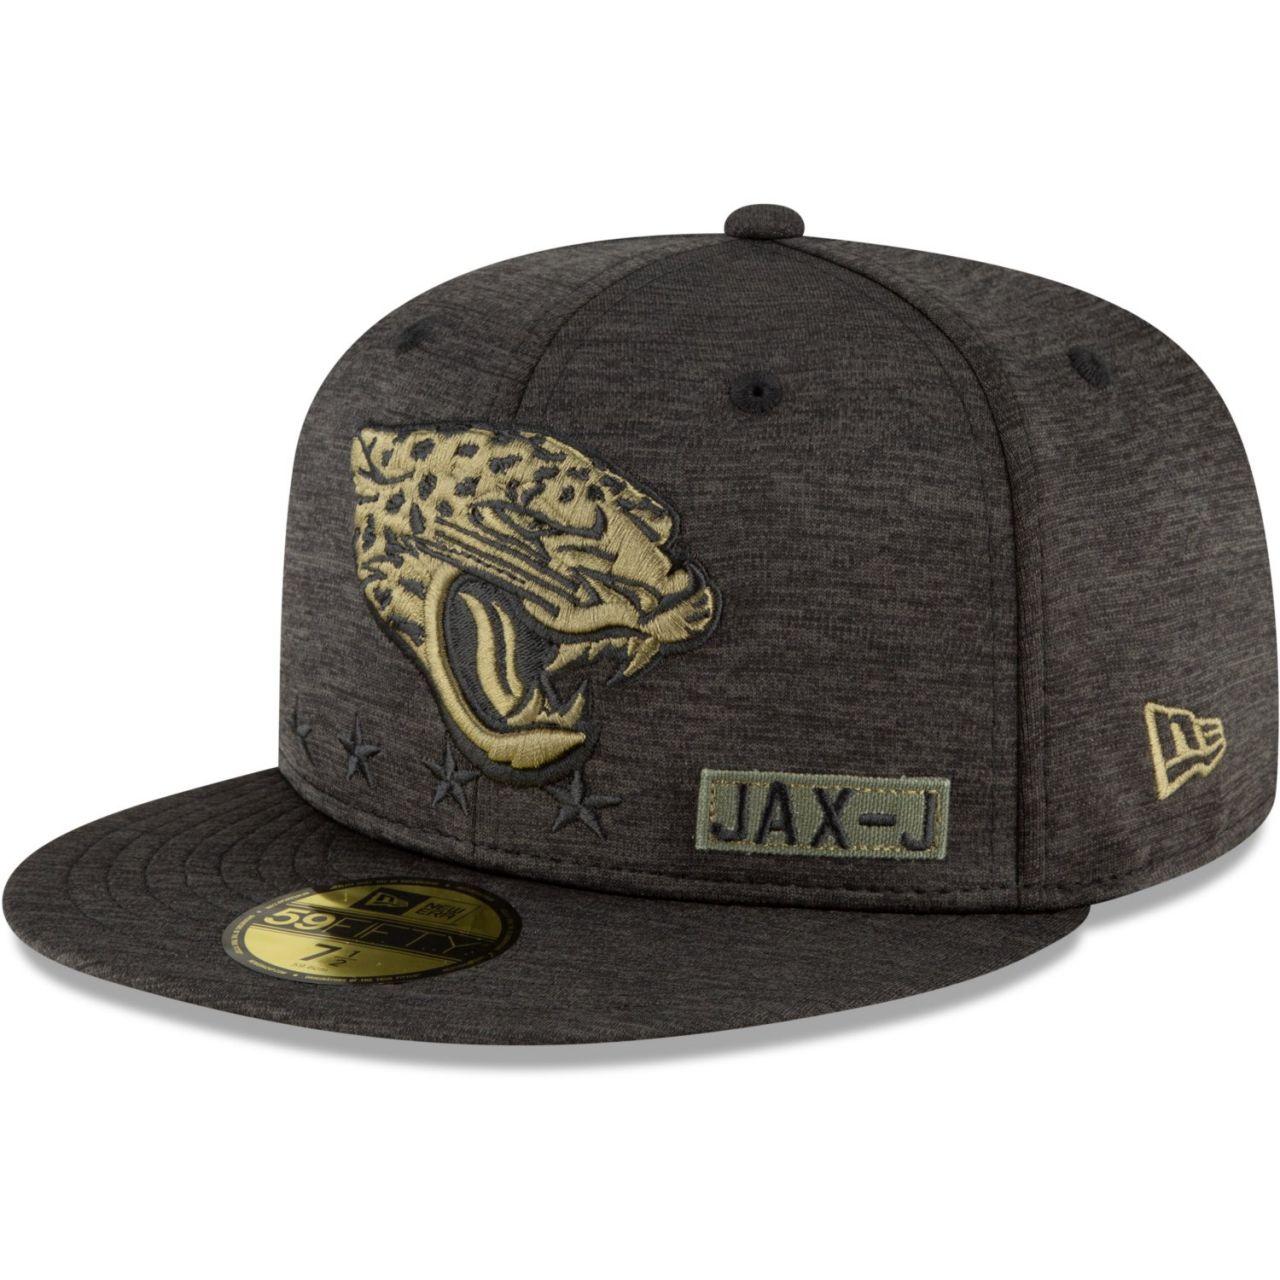 amfoo - New Era 59FIFTY Cap Salute to Service Jacksonville Jaguars